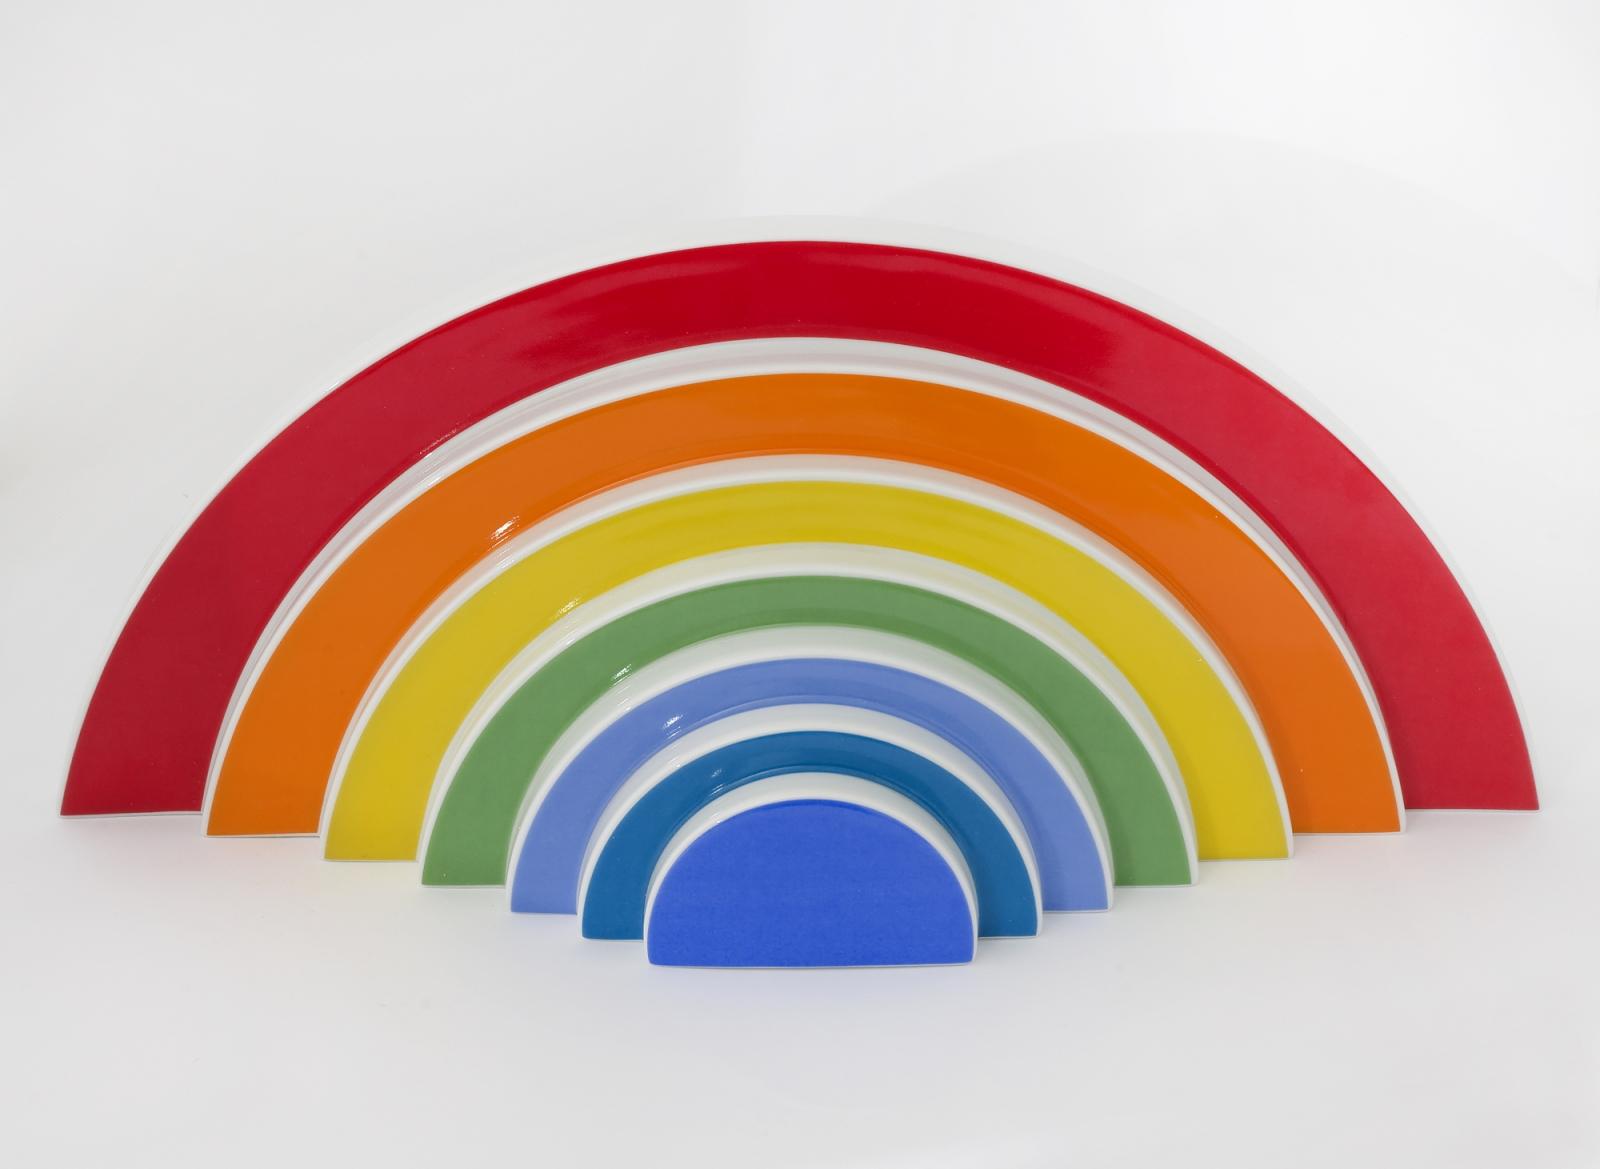 Otto Piene Rainbow Erling Neby Samling Erling Neby